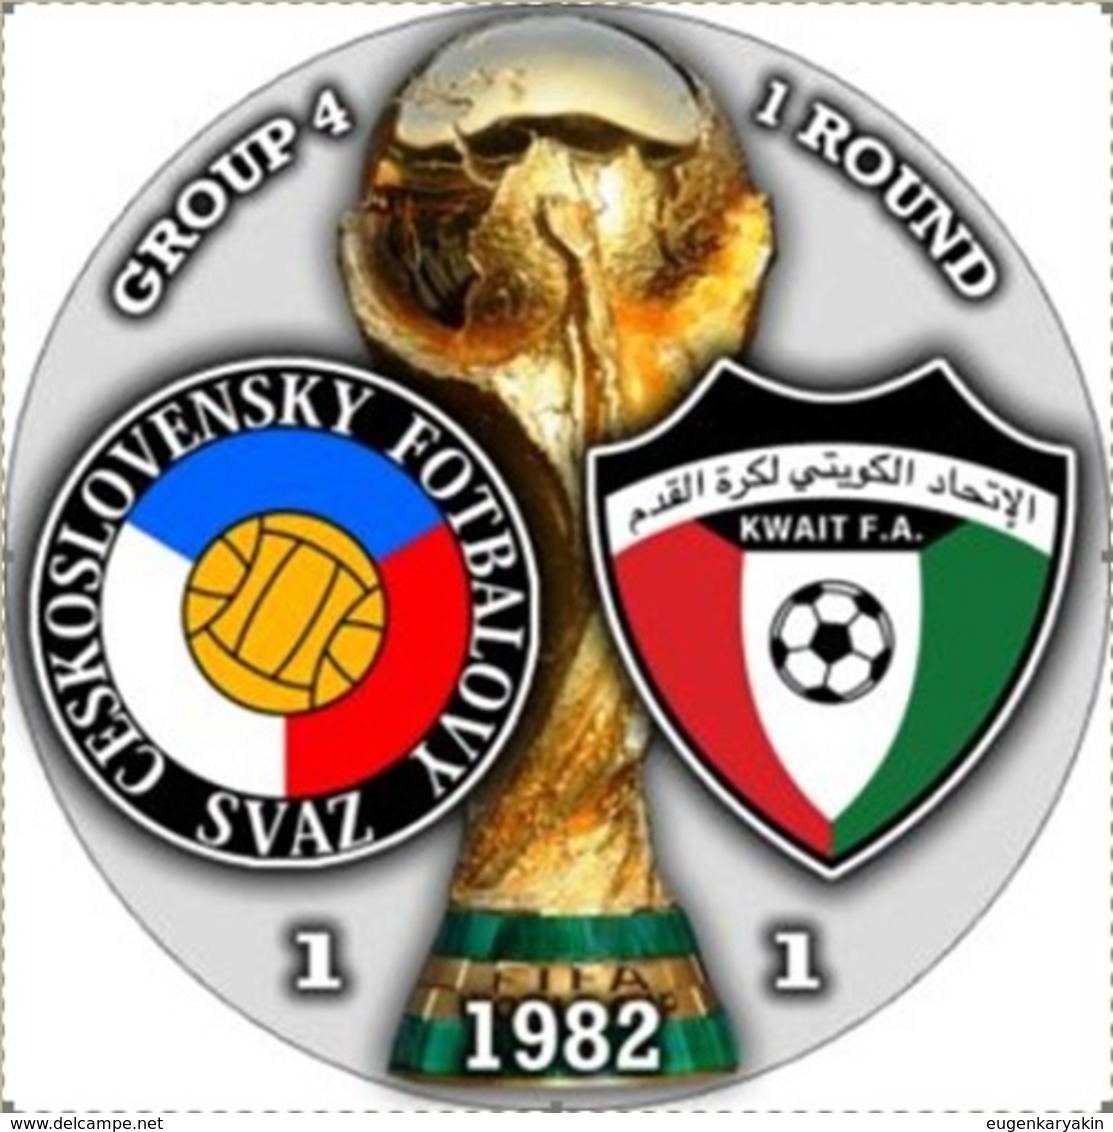 Pin FIFA World Cup 1982 Group 4 Round 1 Czechoslovakia Vs Kuwait - Fussball